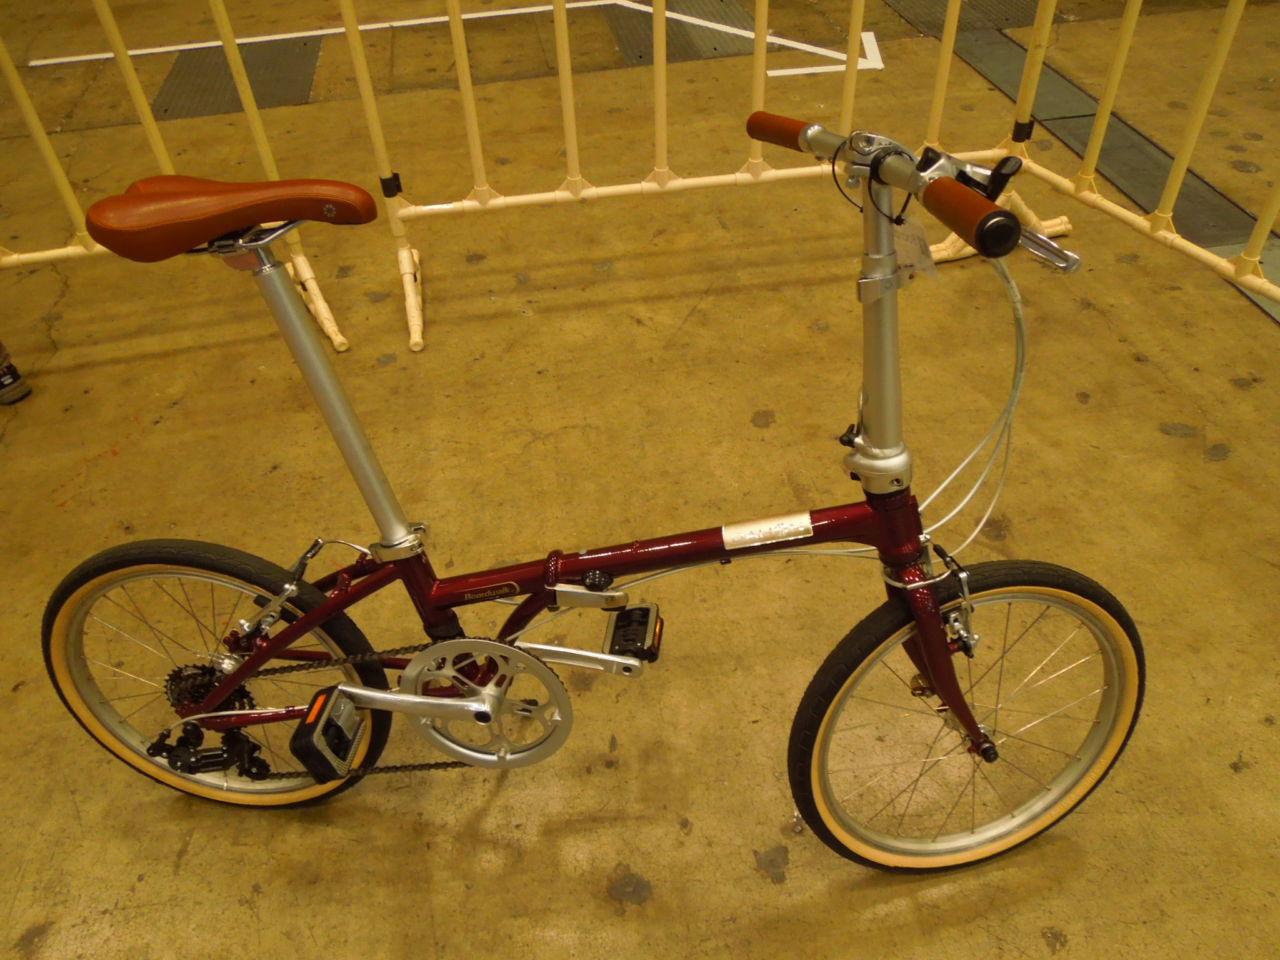 Dahon Oemモデルとの違いを実感する折りたたみ自転車 Dahon Boardwalk